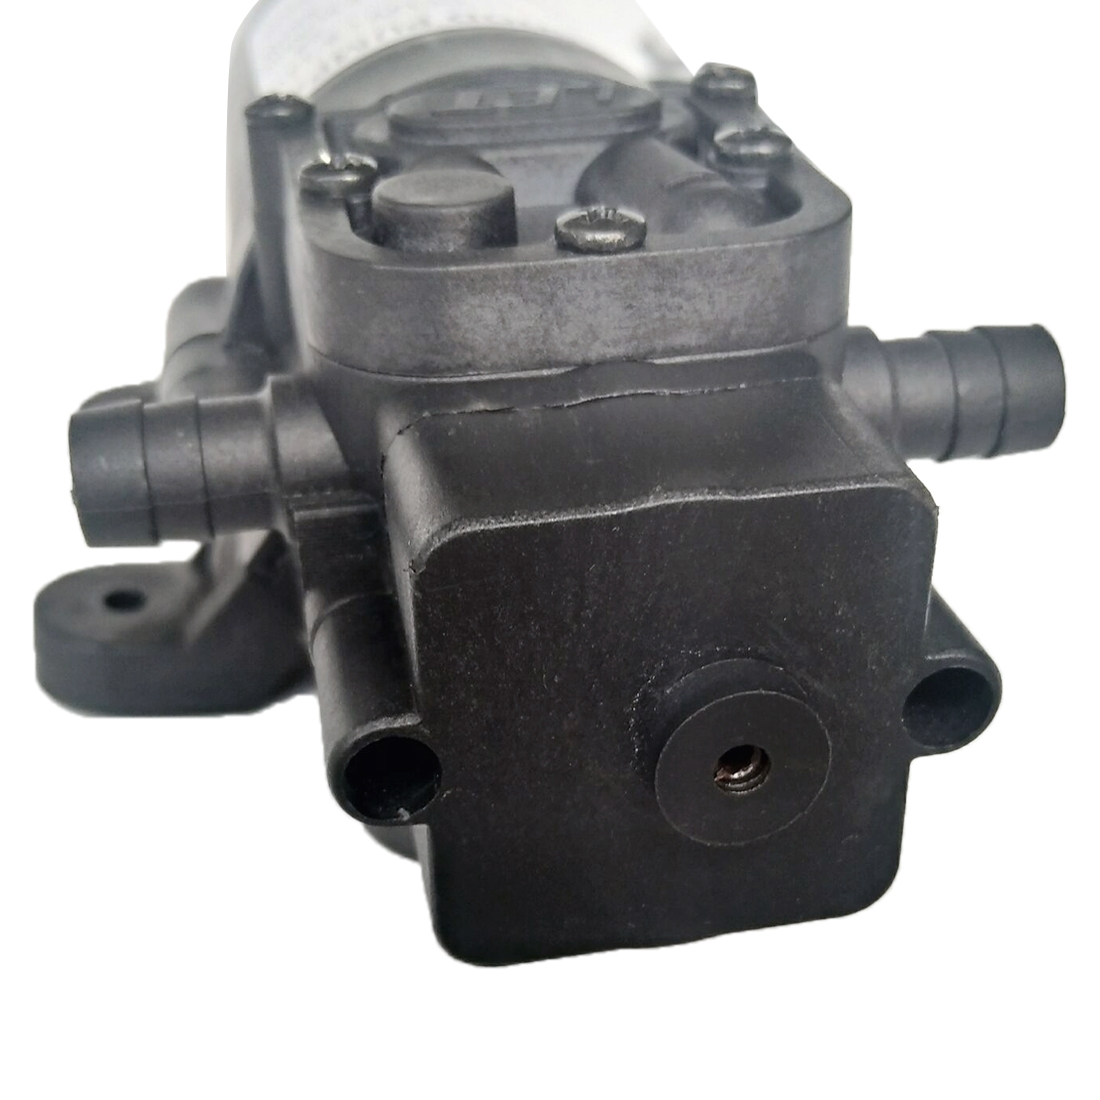 Diaphragm Reflux Mini Electric Water Pump 29W High Pressure Self-priming Water Pump for Car Washing / Irrigation, Voltage: 12V